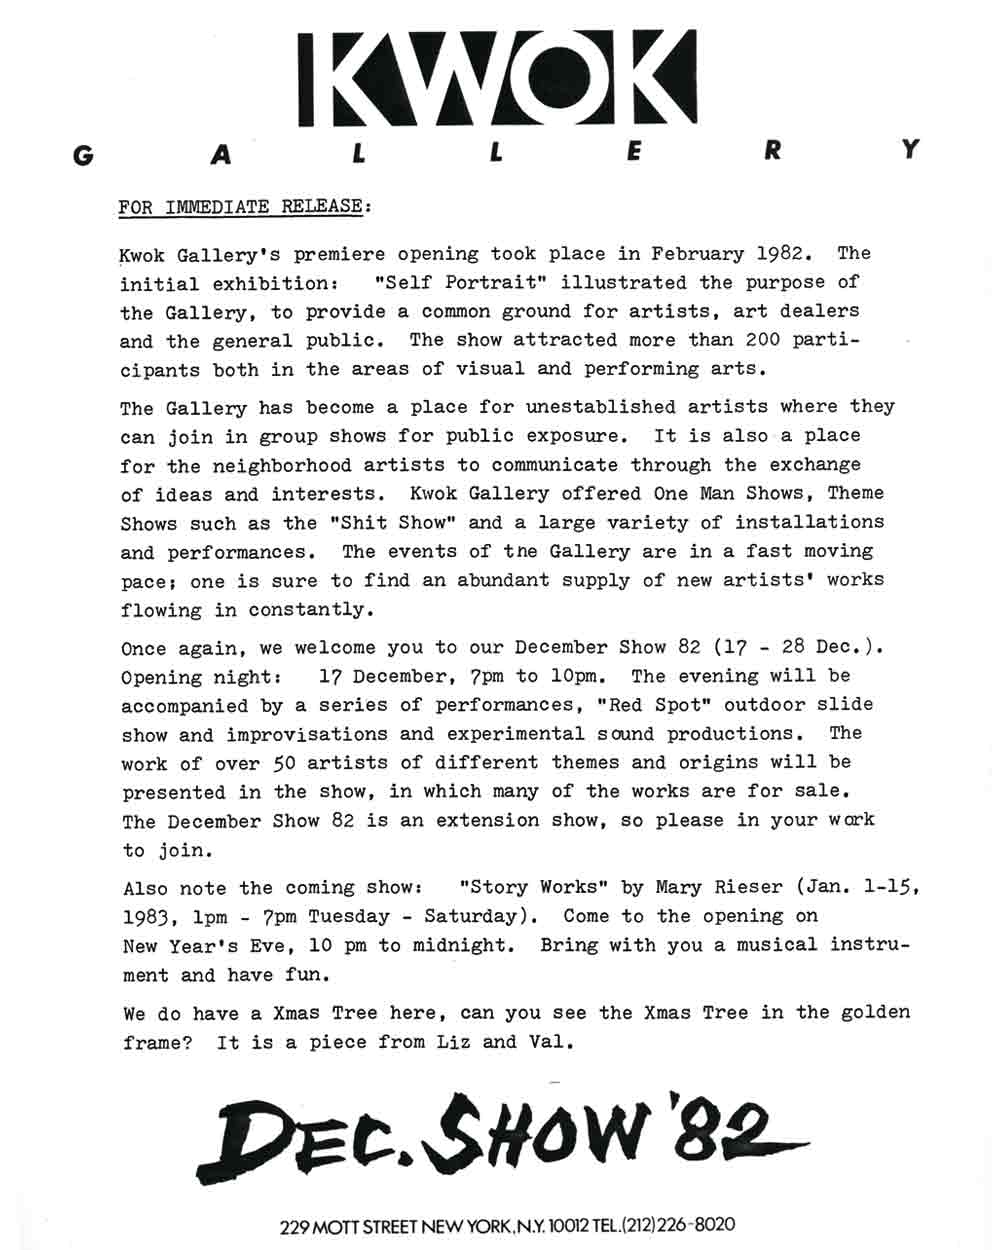 December Show press release, pg 1